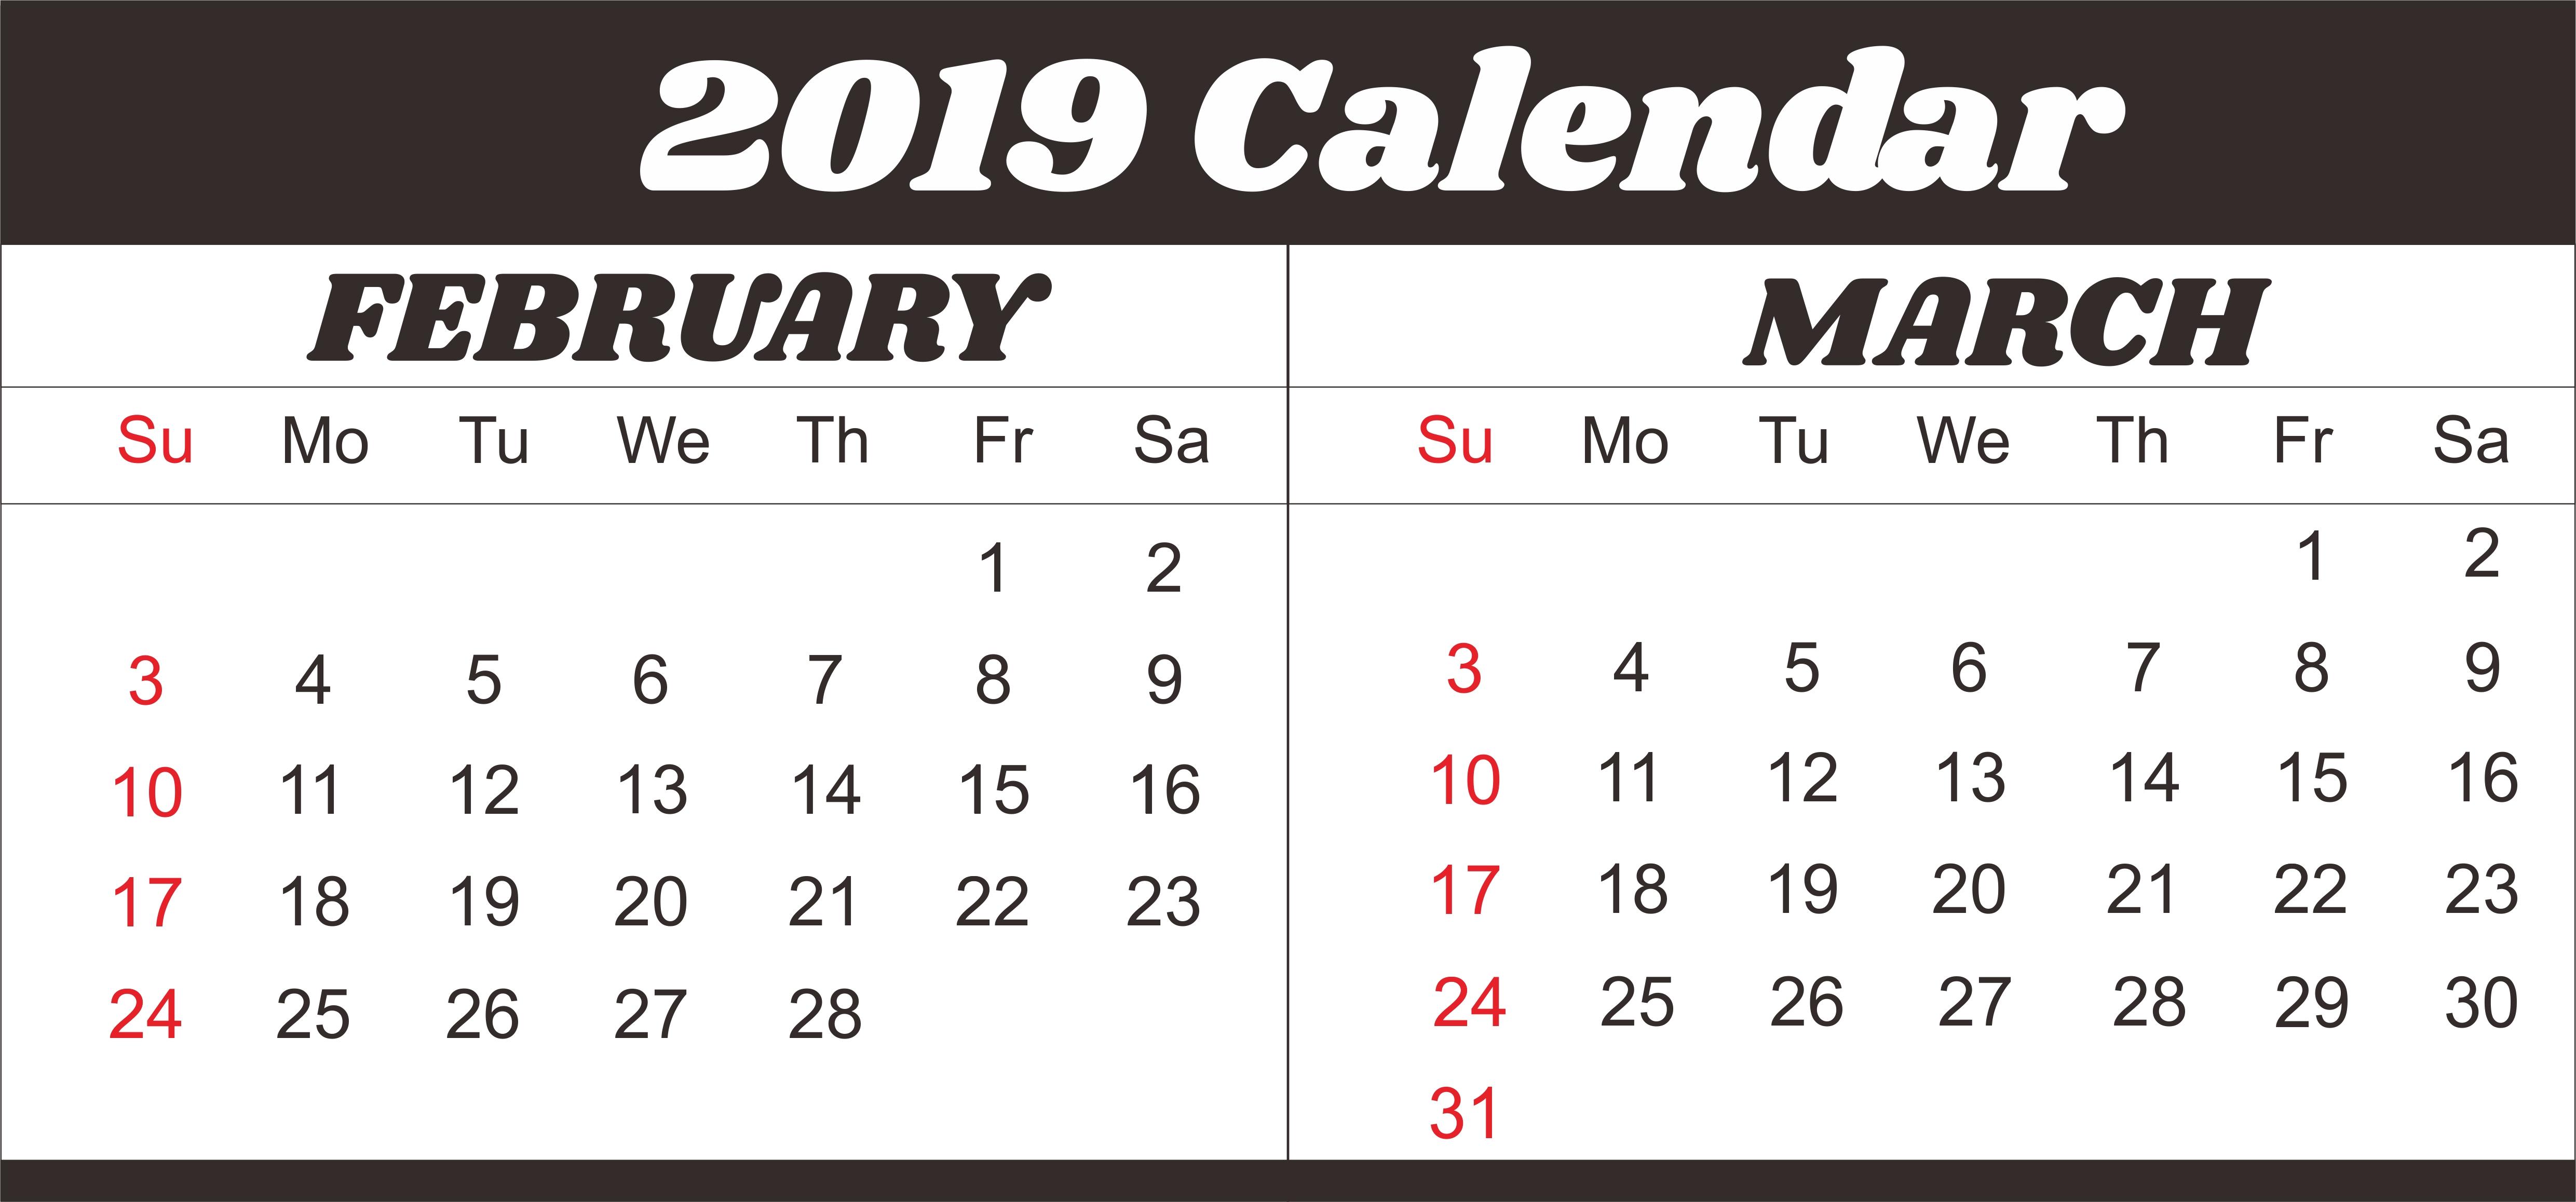 February March 2019 Calendar Template #februarycalendar March 2 2019 Calendar